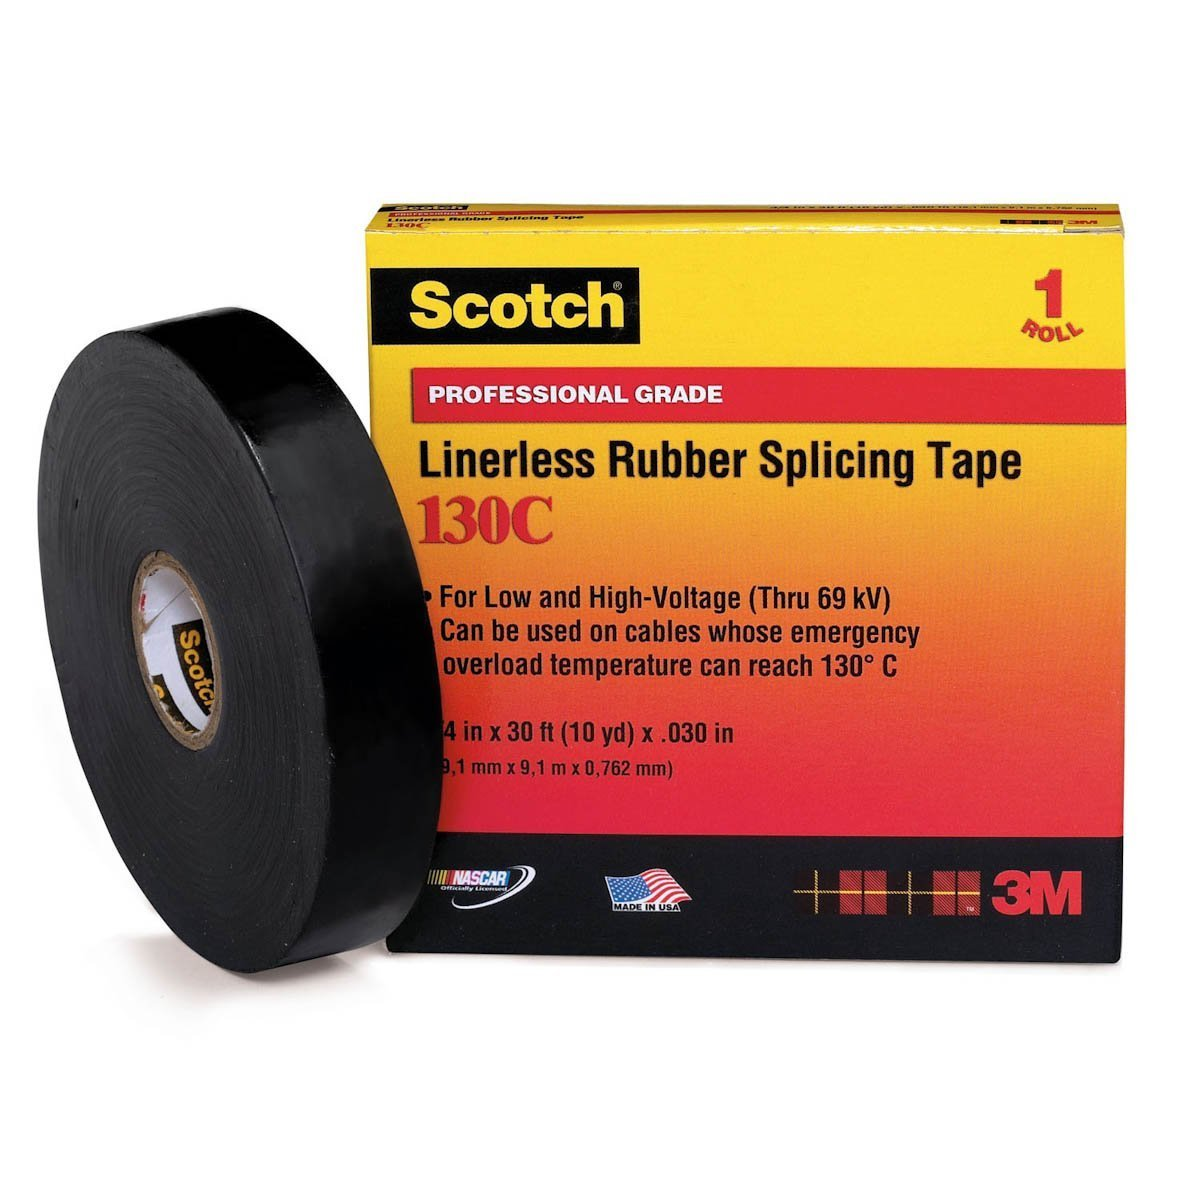 3M 130C High-Voltage Rubber Splicing Electrical Tape, 1'' X 30' (1 per Pack)